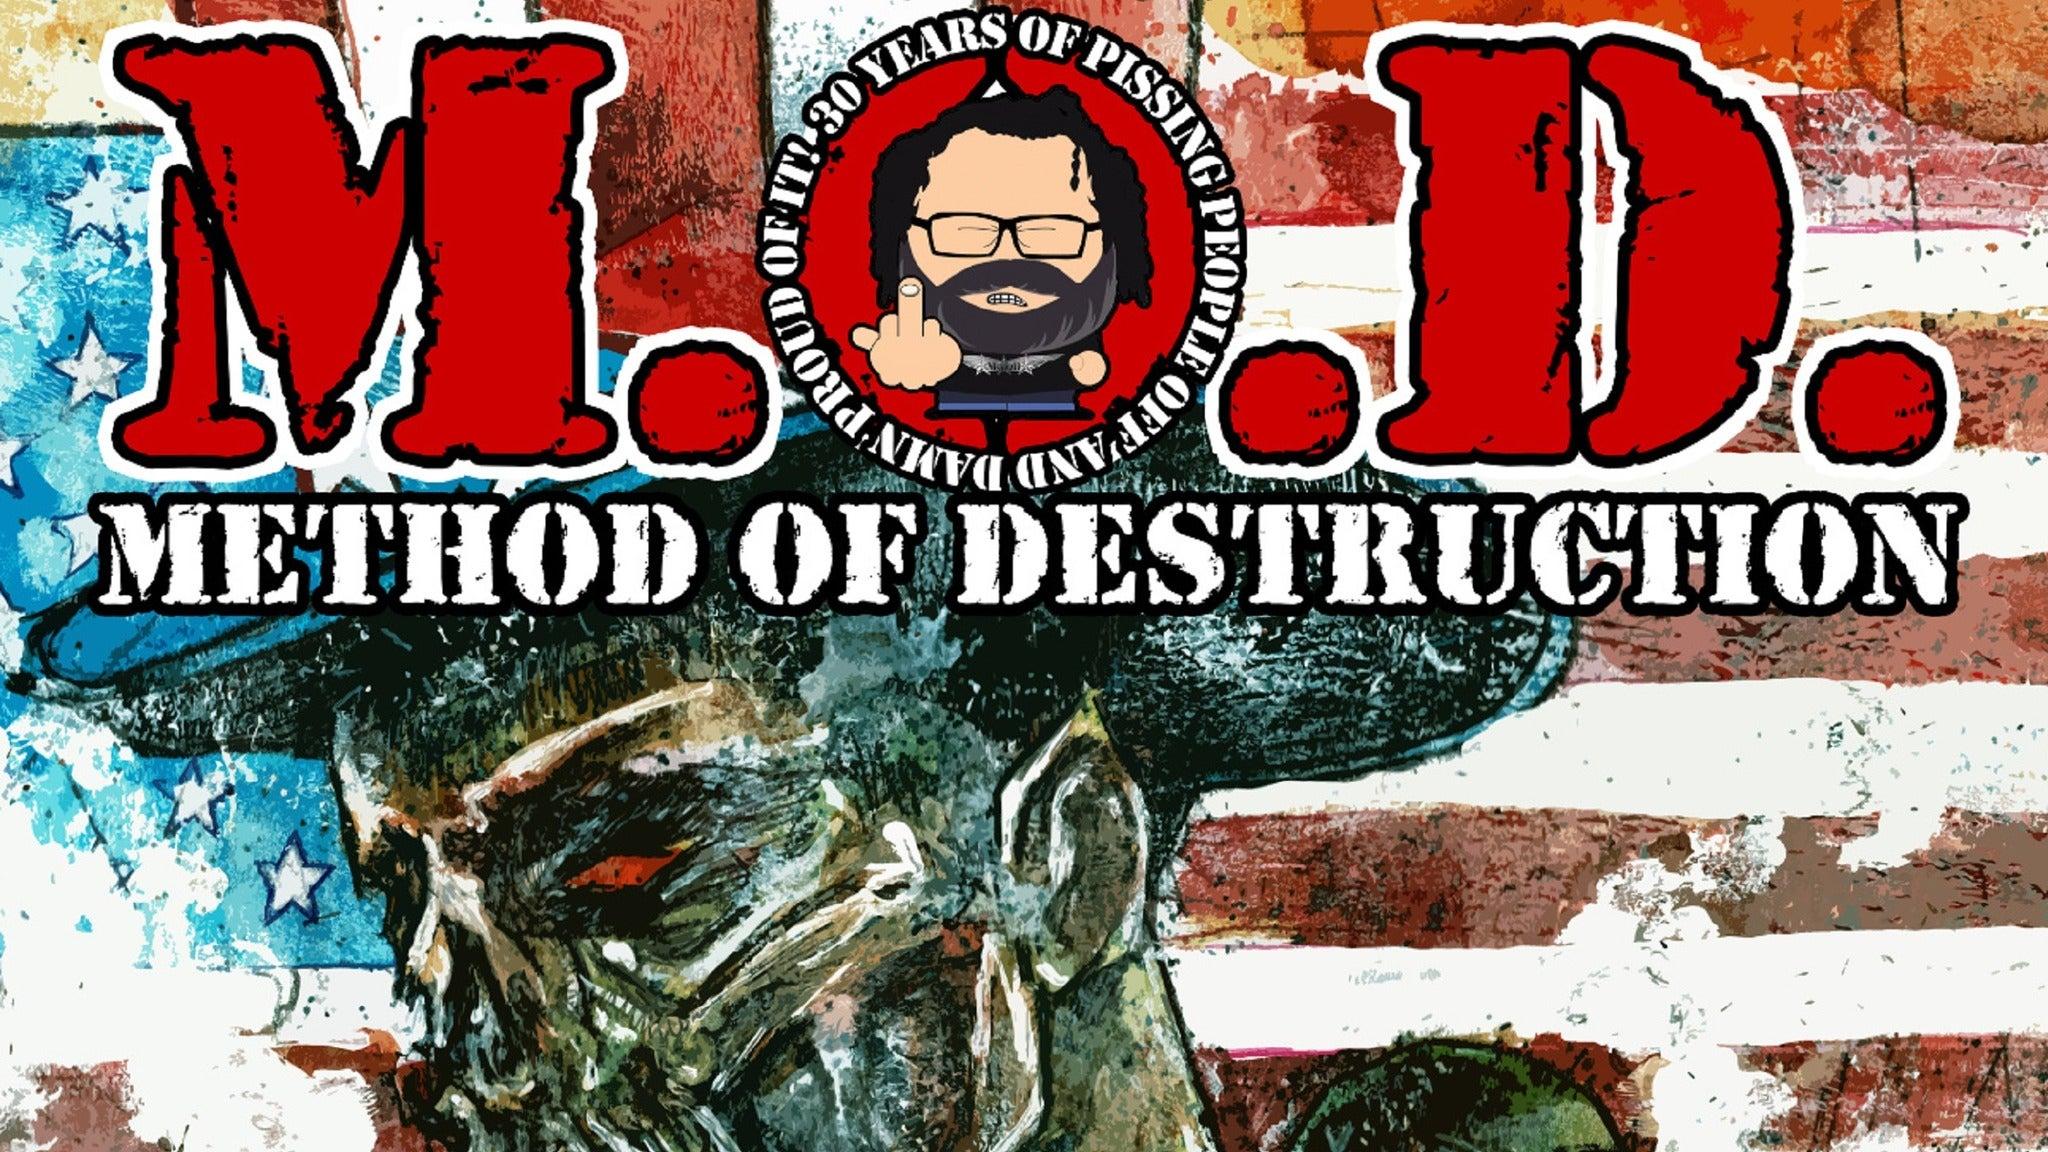 M.O.D. (Method of Destruction) wsg Skarhead